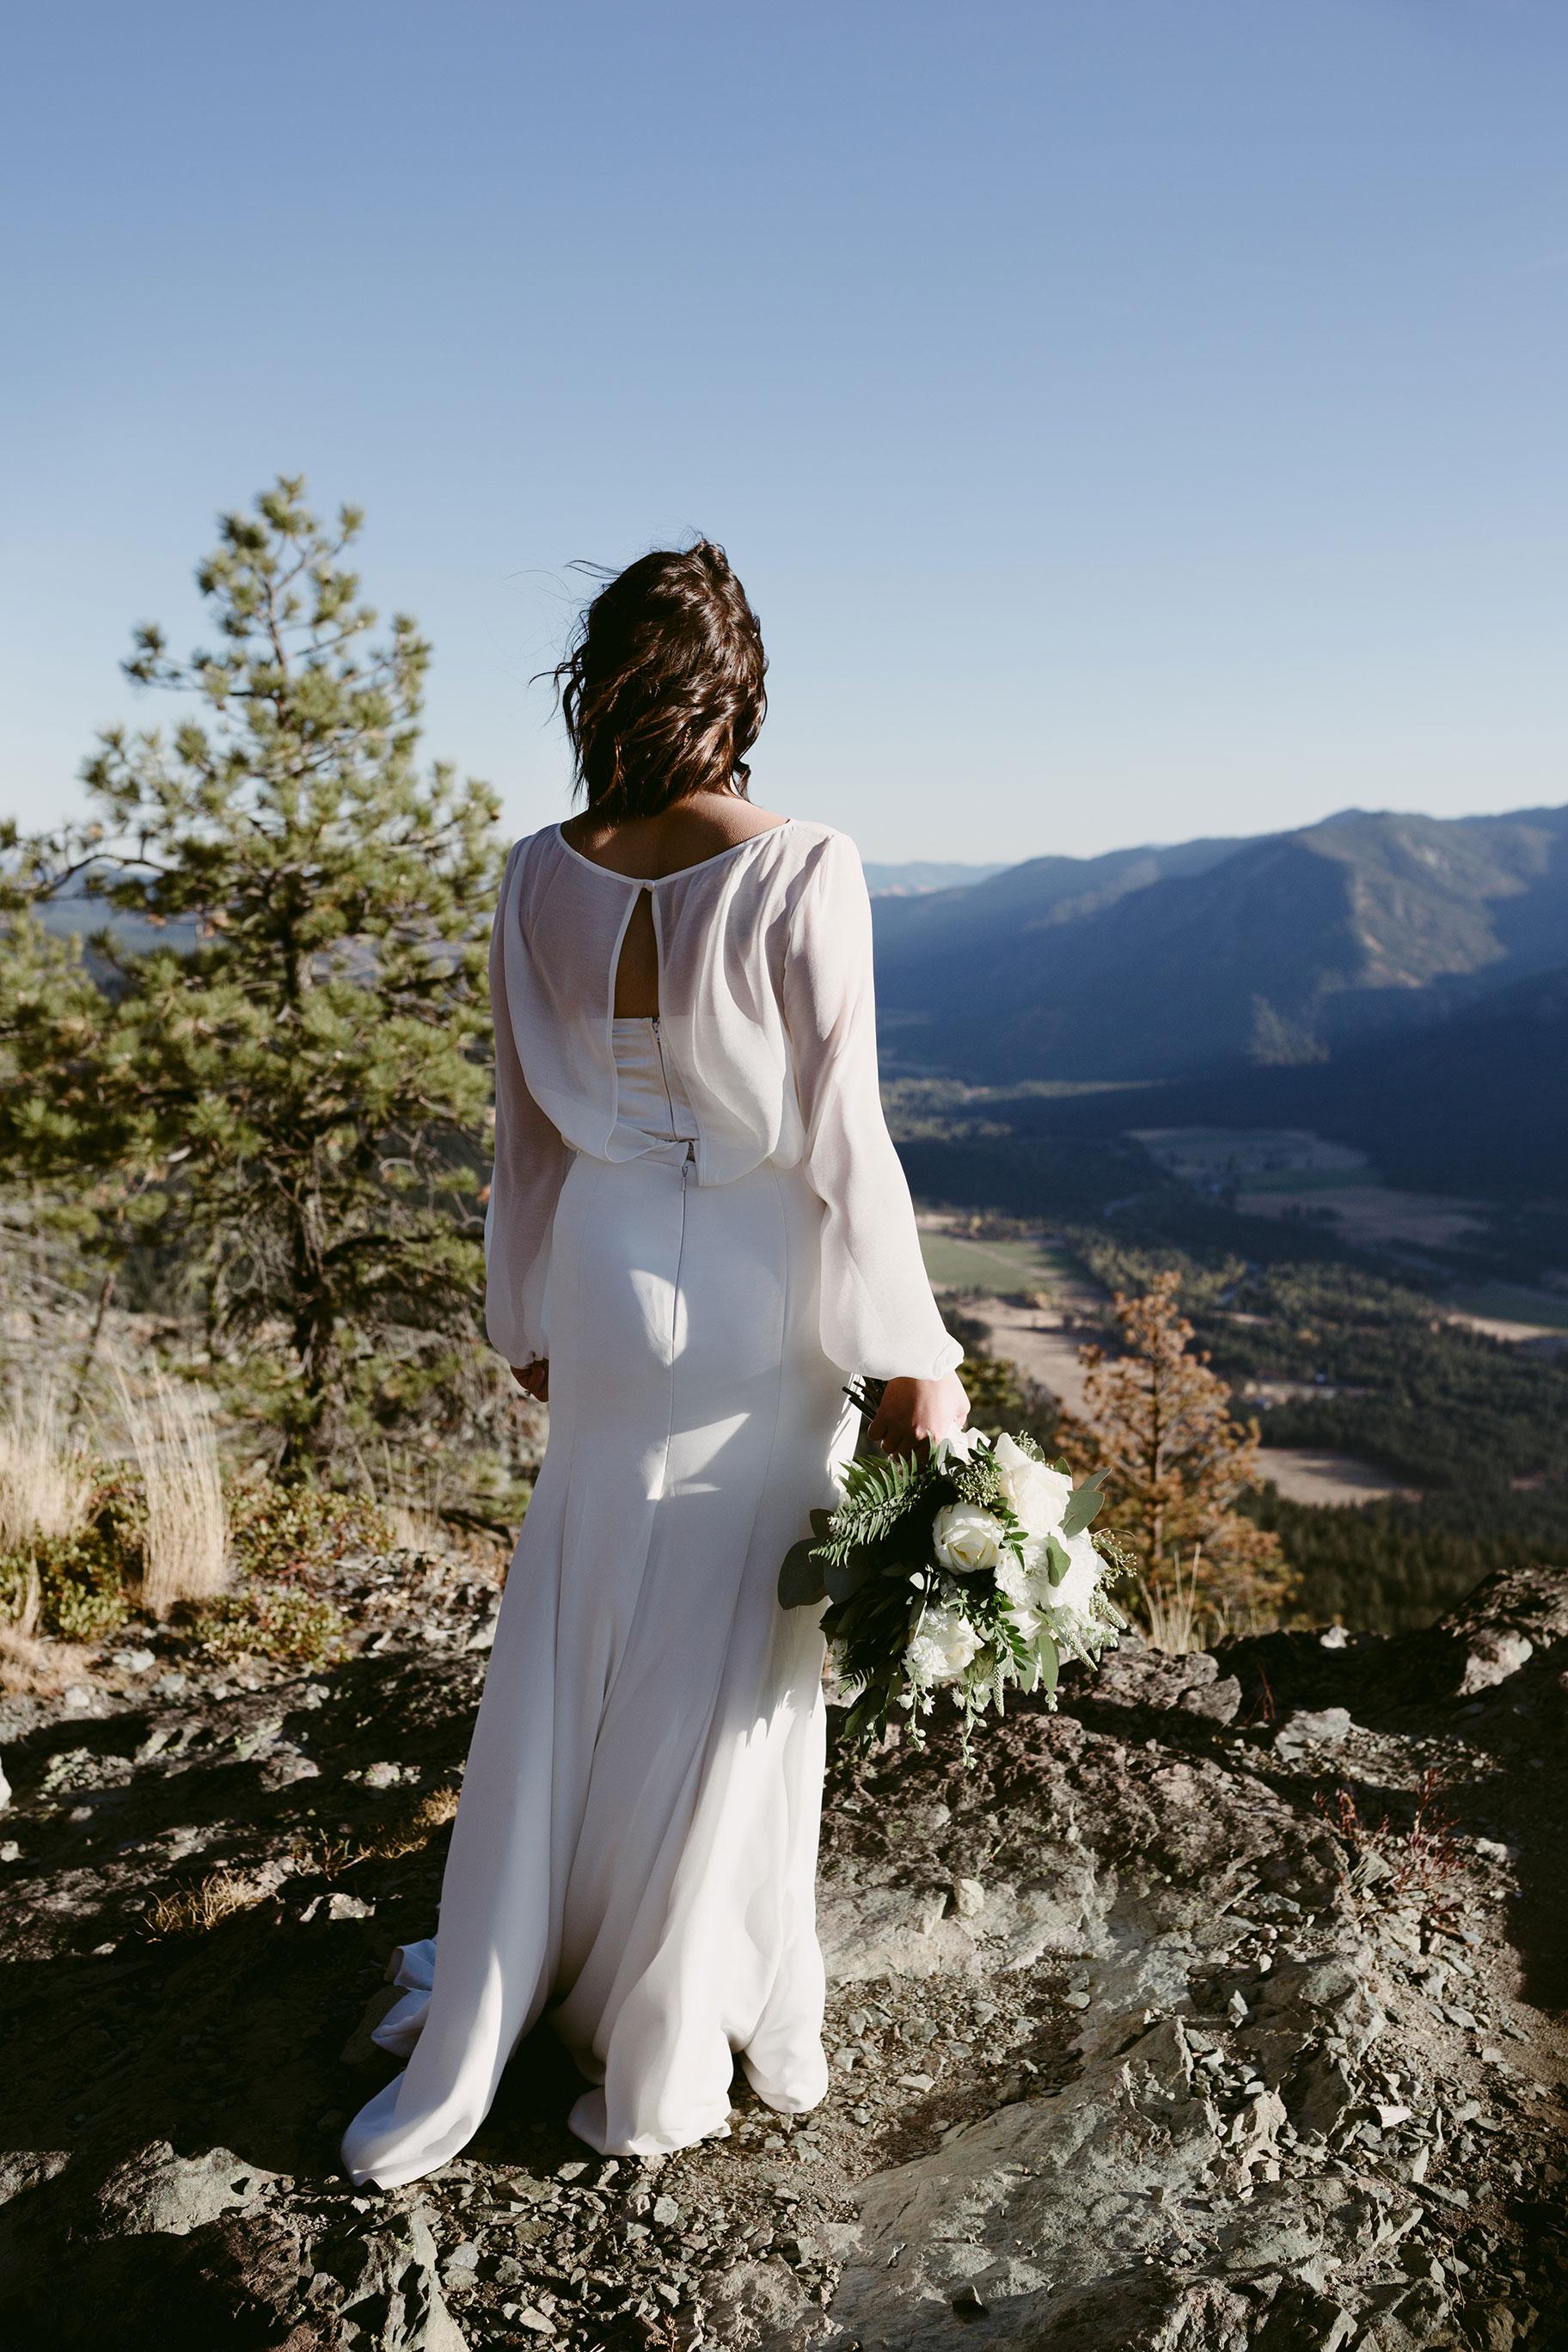 Bride overlooking mountains winthrop wa